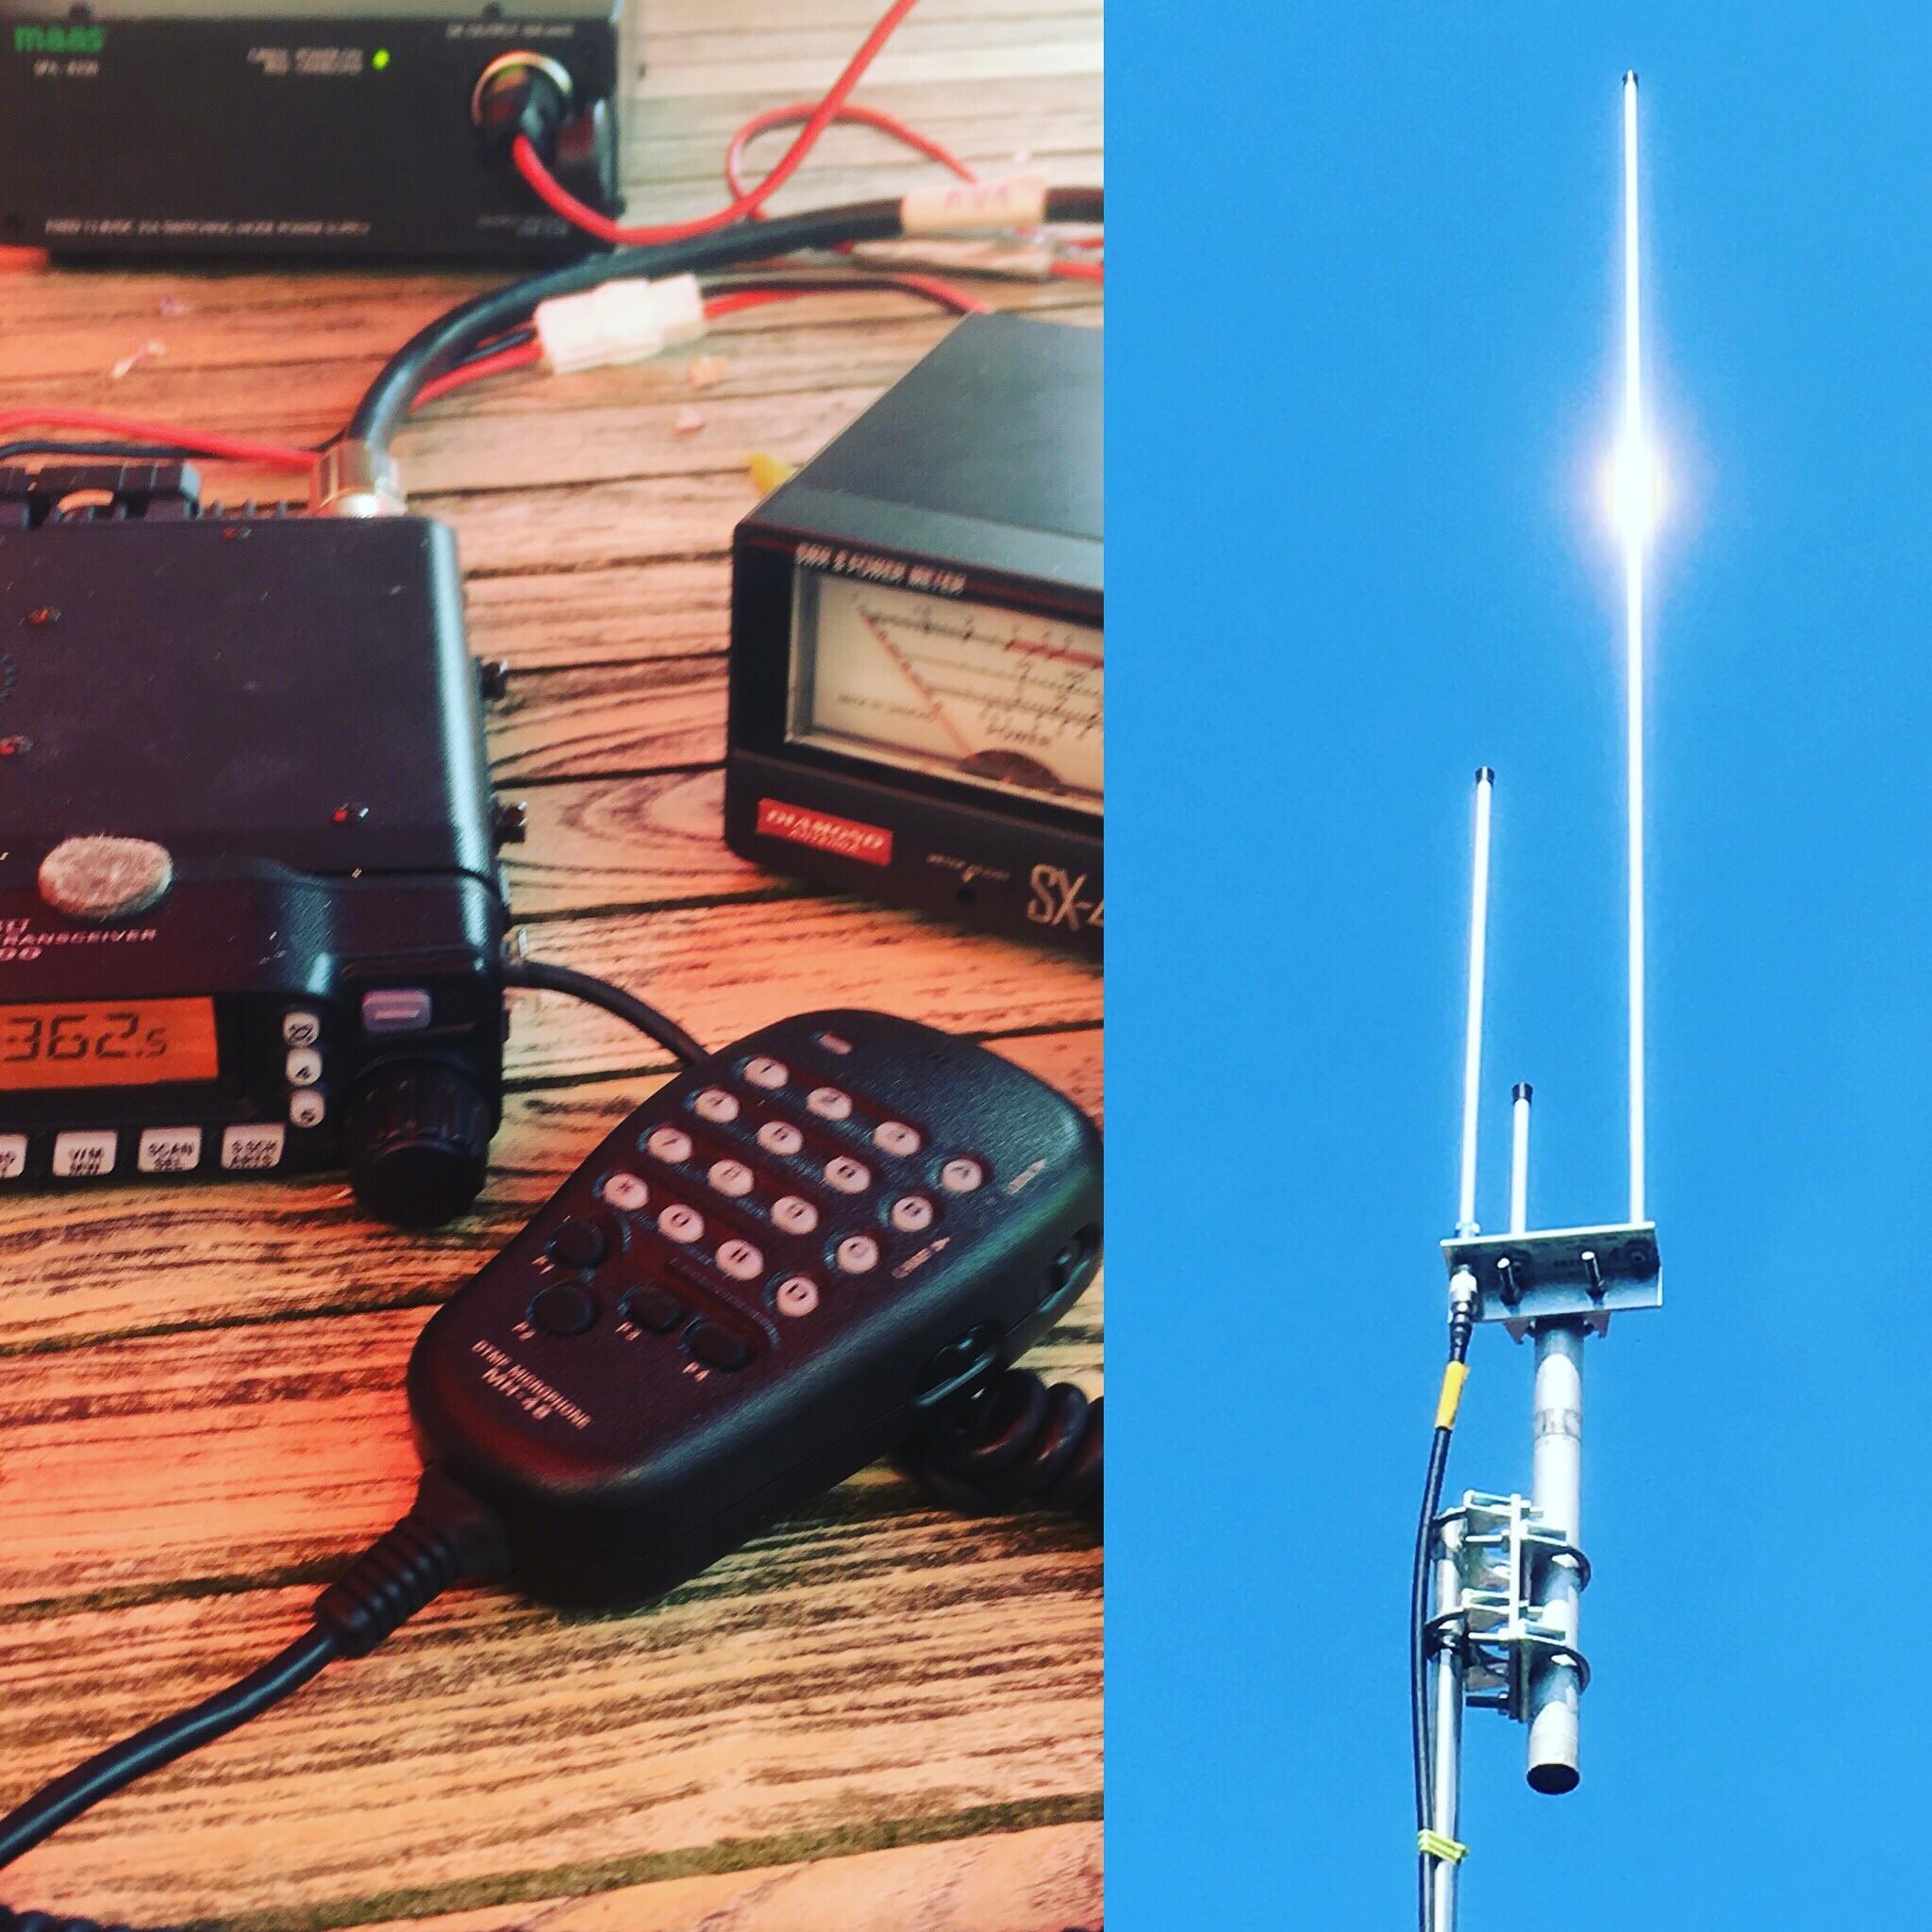 Dualband antenne 2/70 EA270J